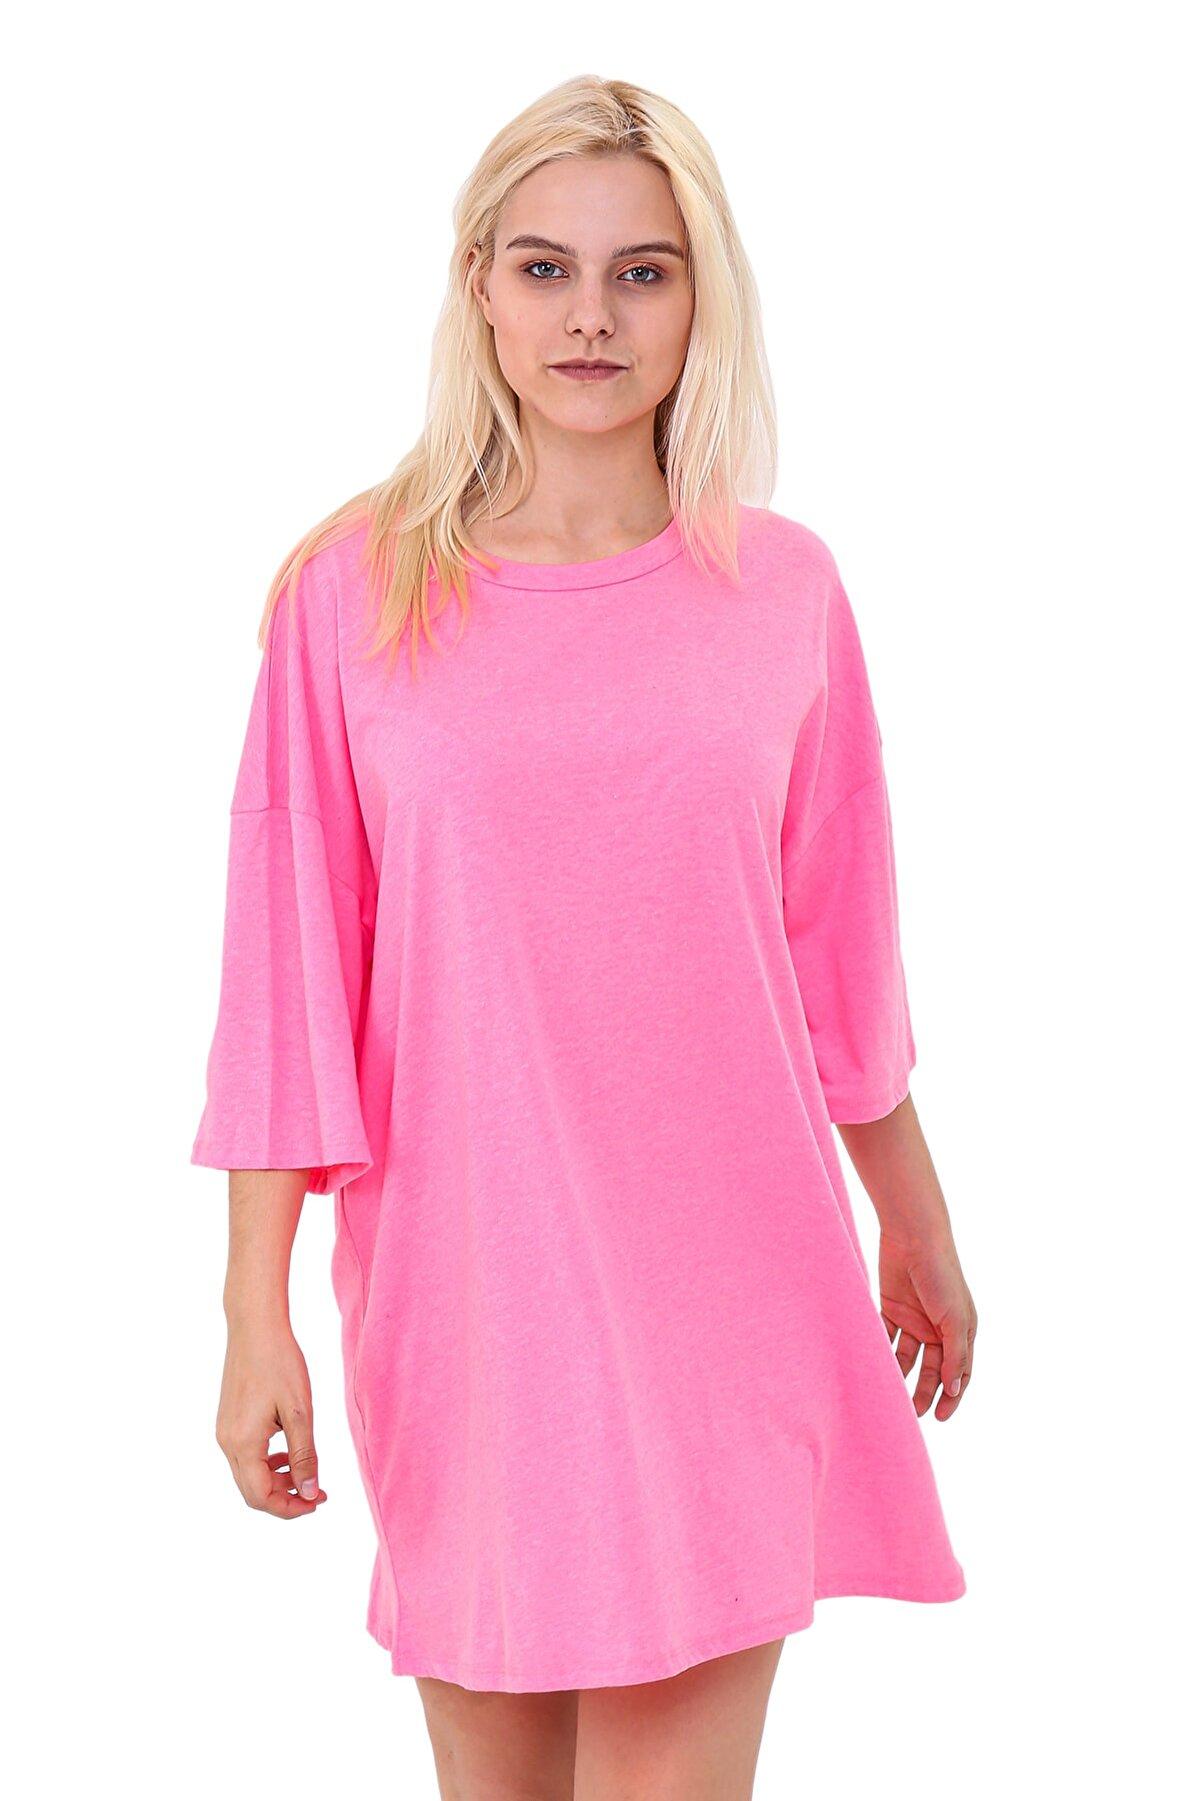 L' Azull Neon Pembe Oversize T-shirt Elbise